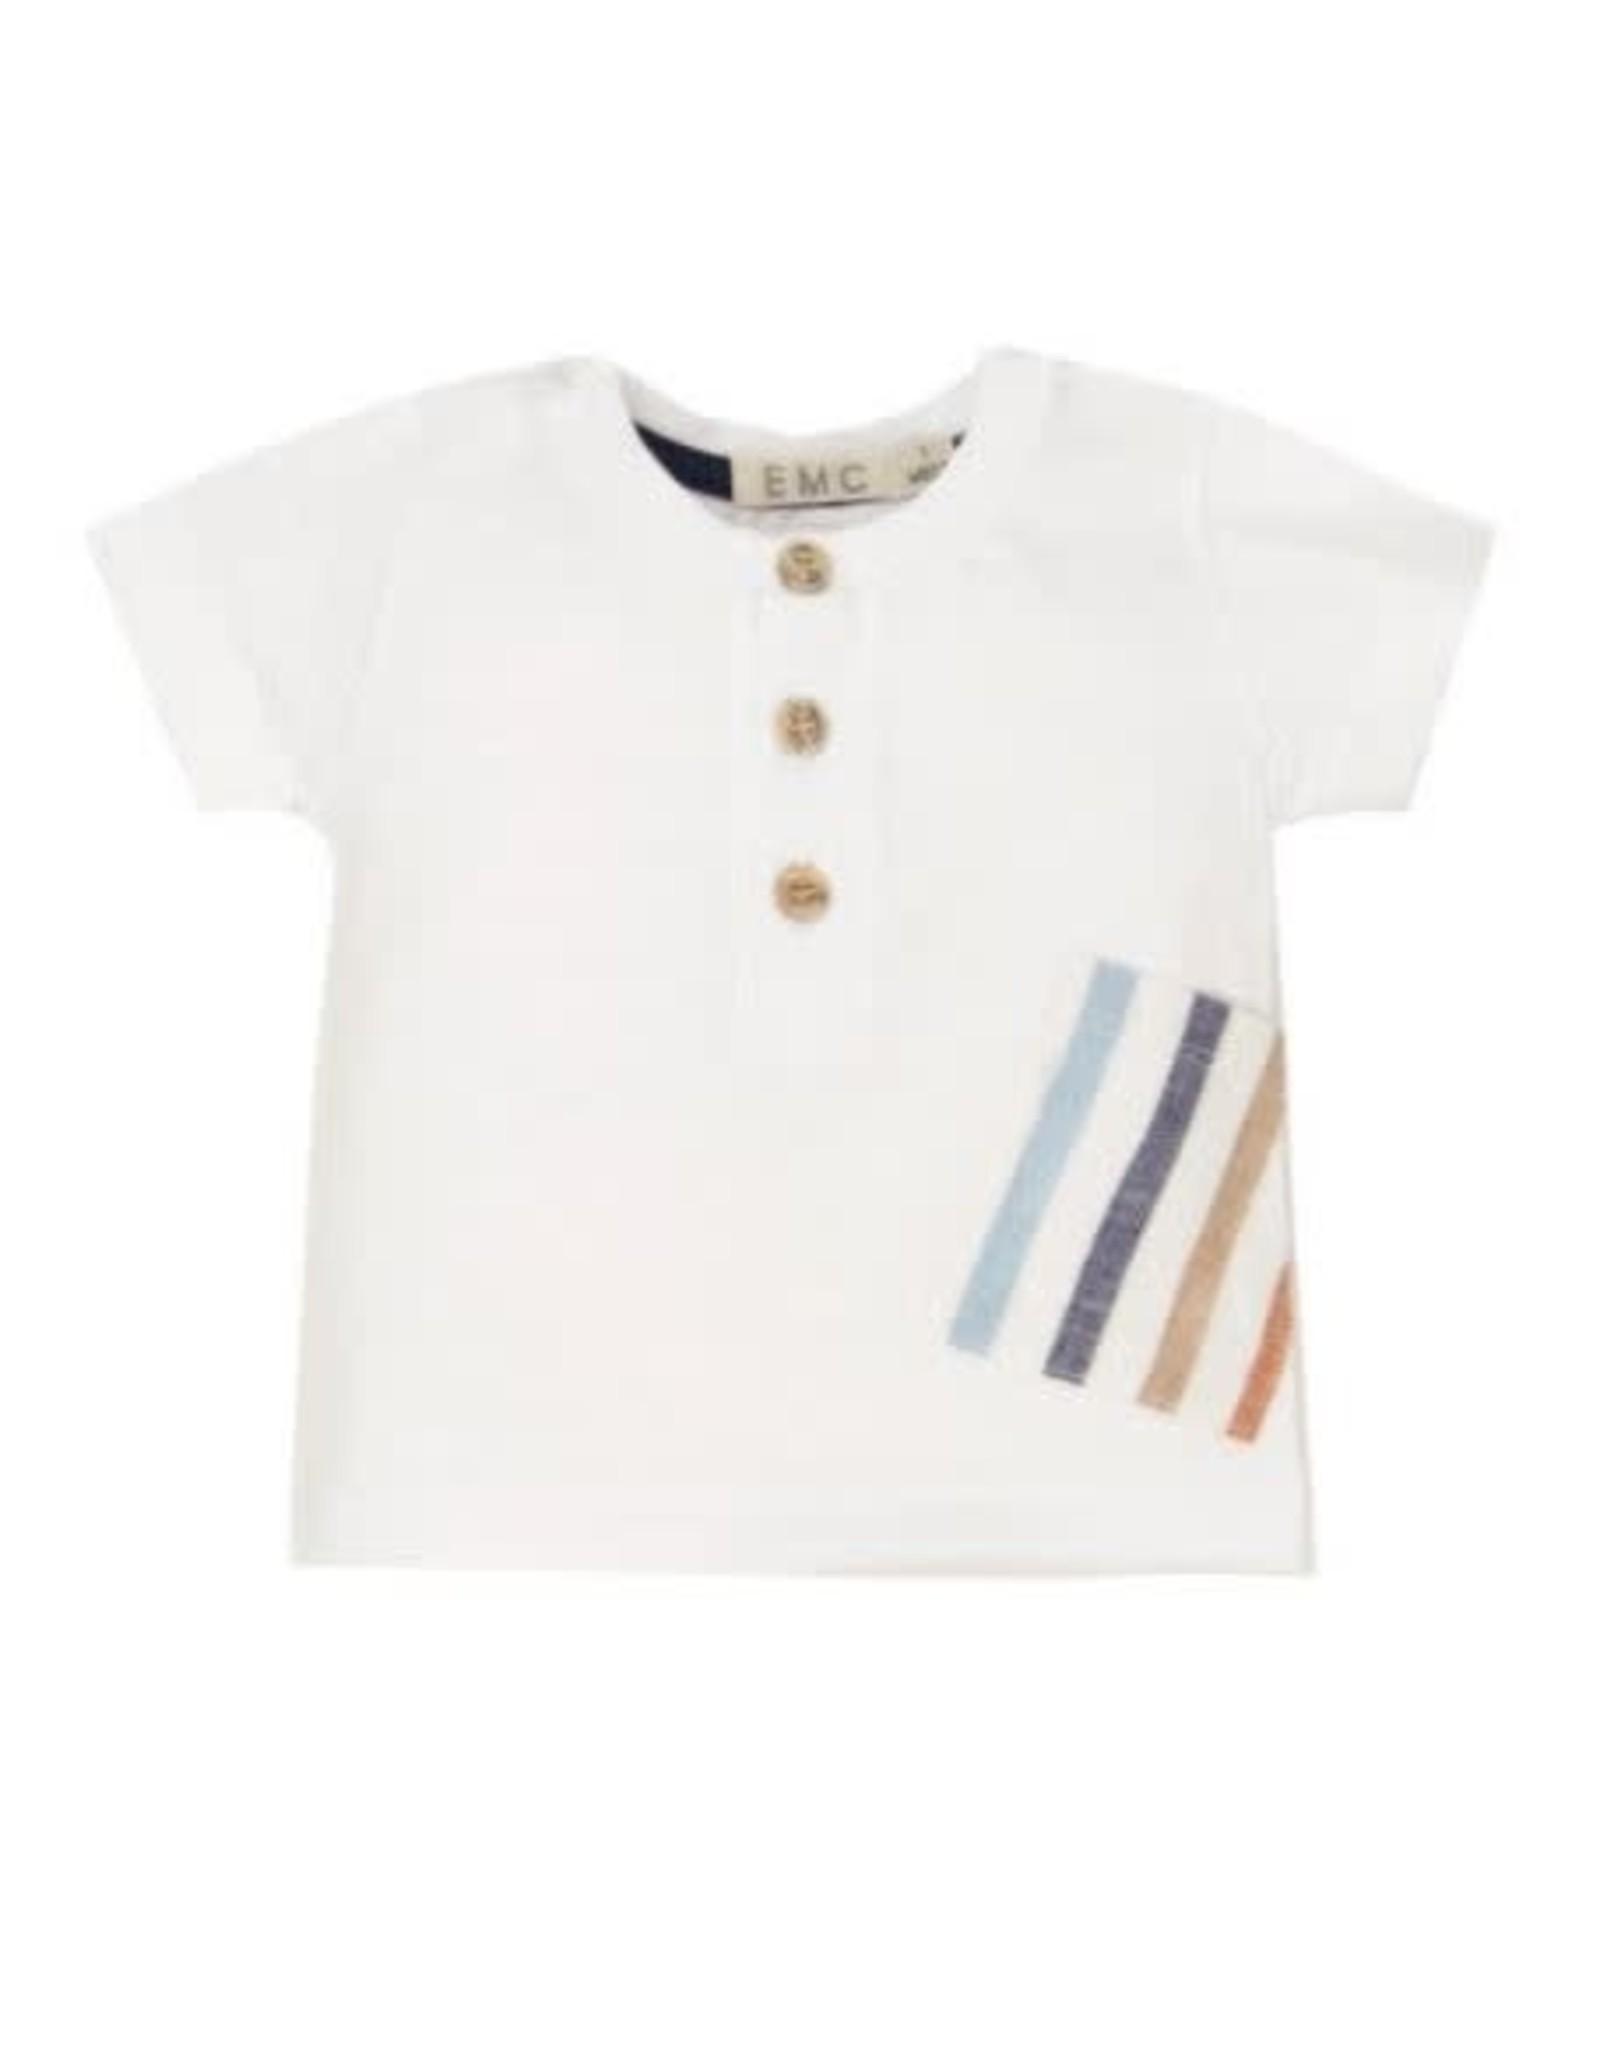 EMC Slub Jersey and Cotton Linen Short Sleeve T-Shirt